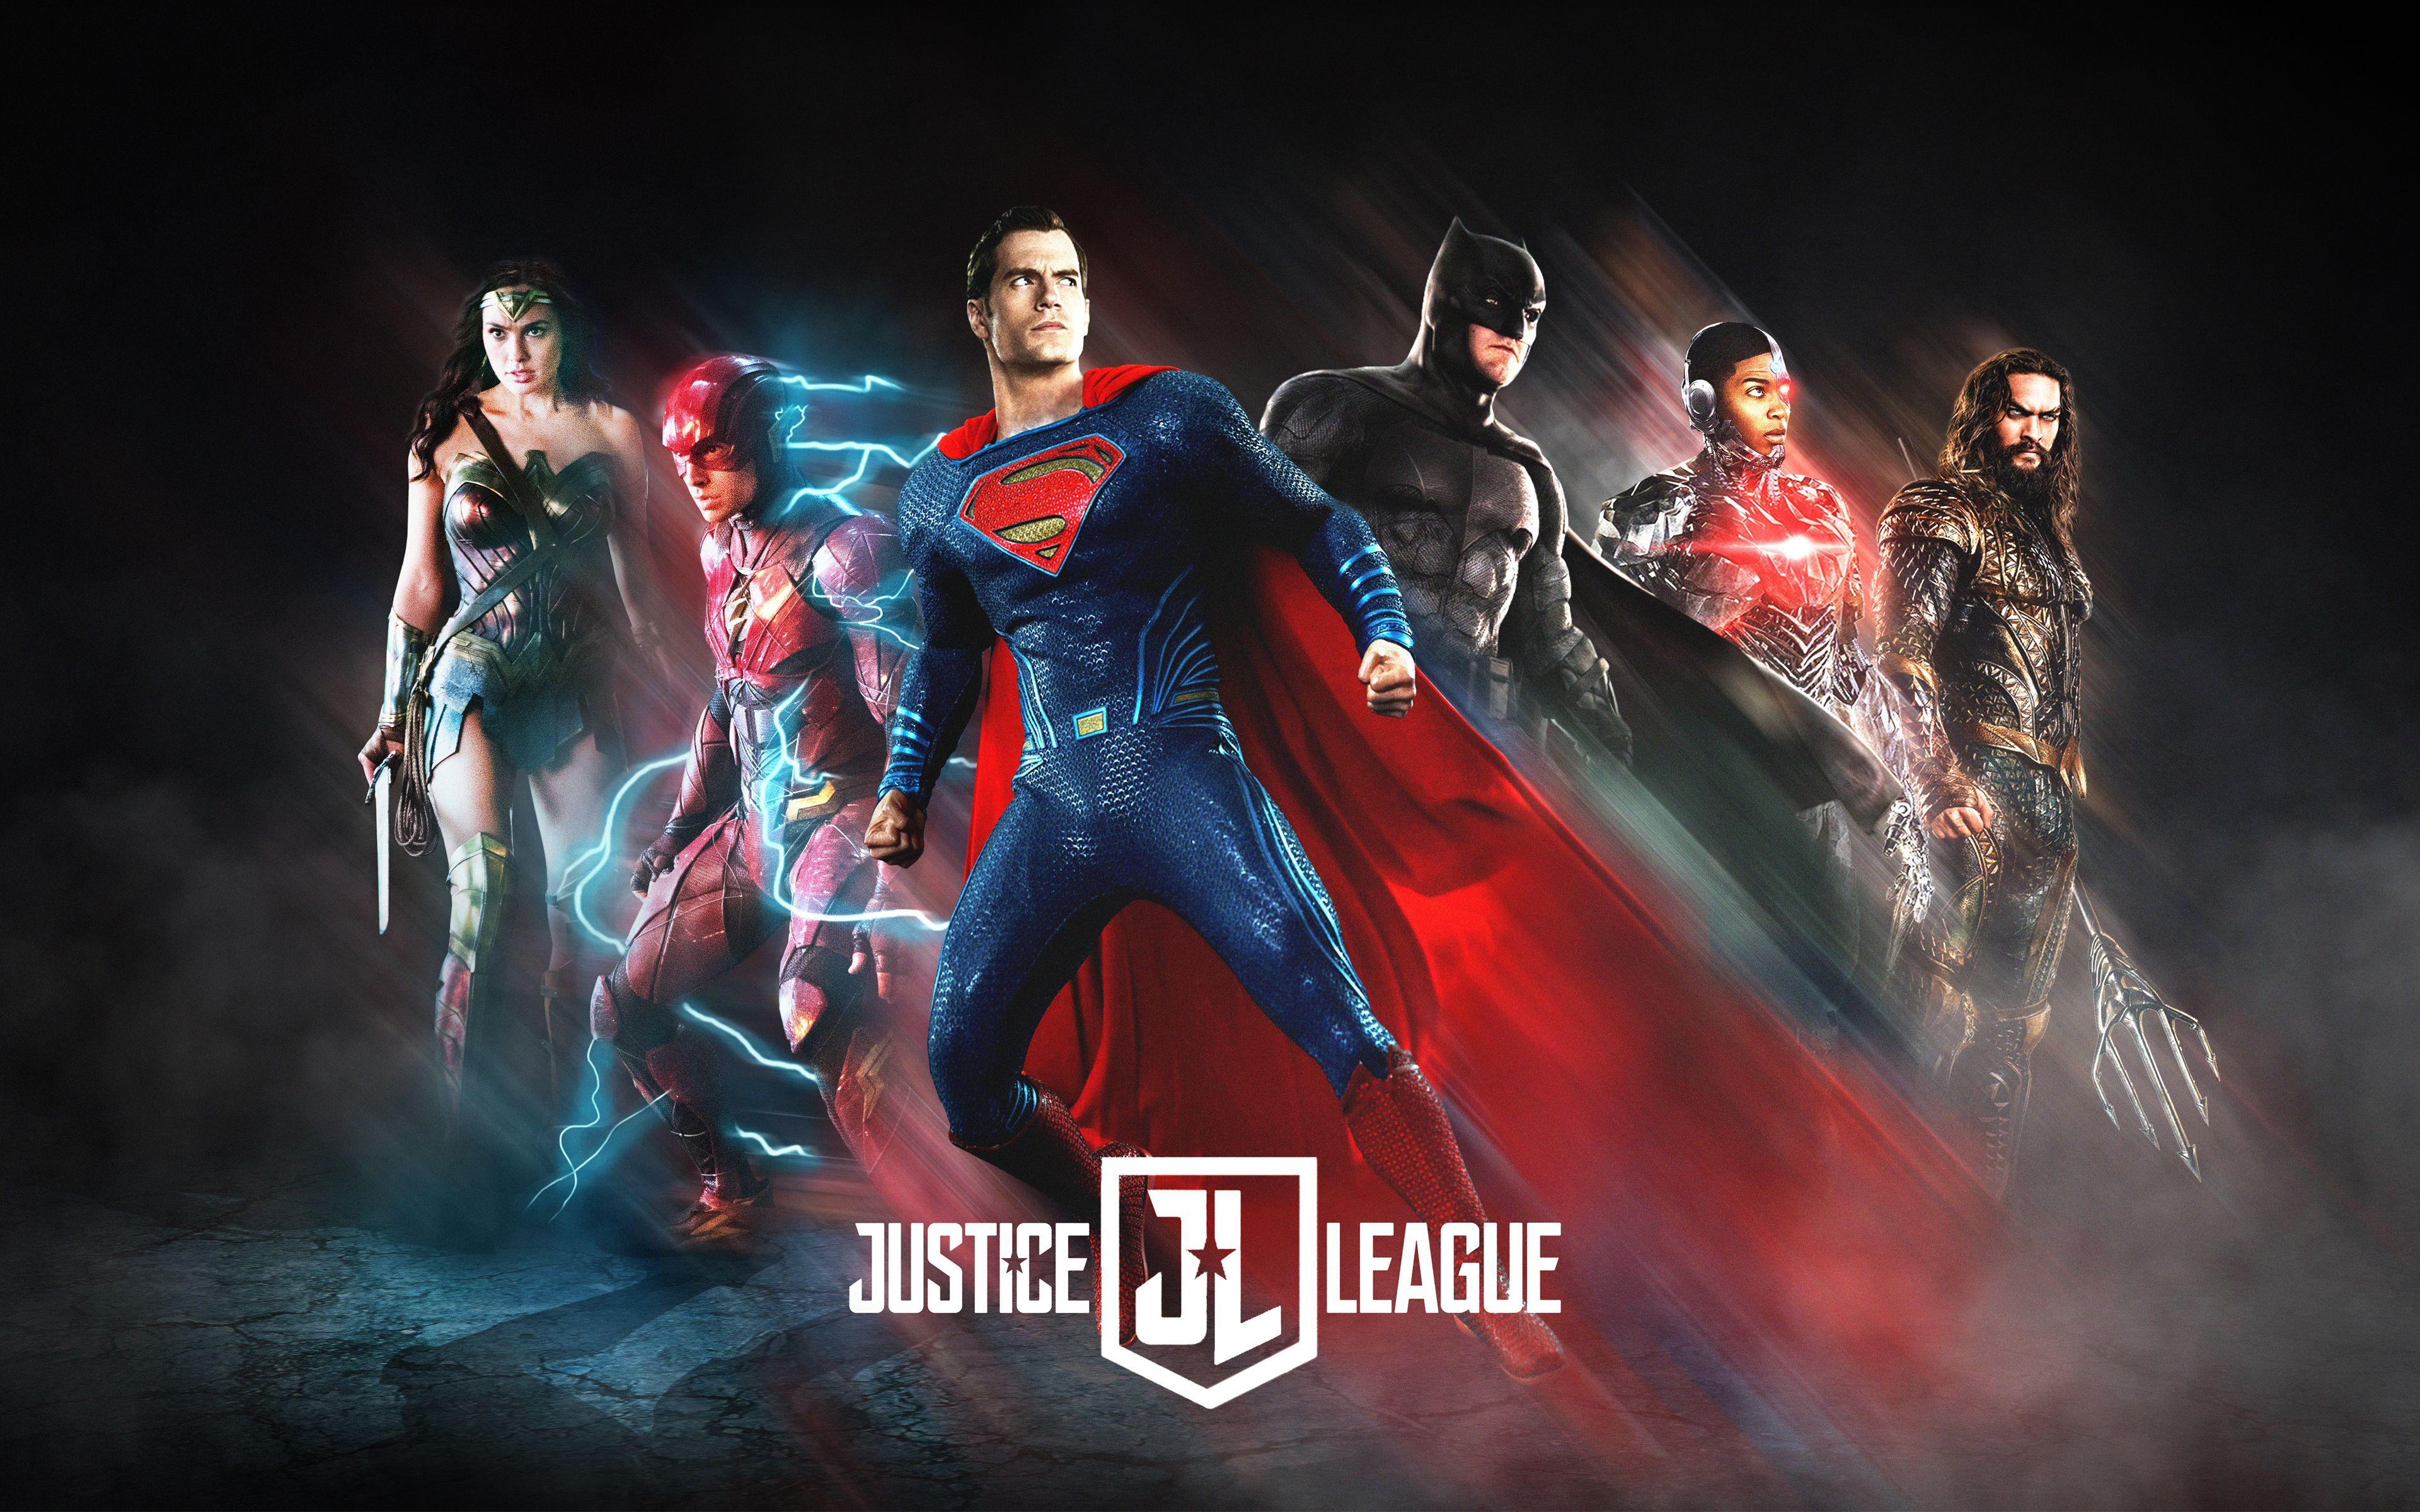 Justice League Hd 4k 8k Justice League Hero Poster Justice League Wonder Woman